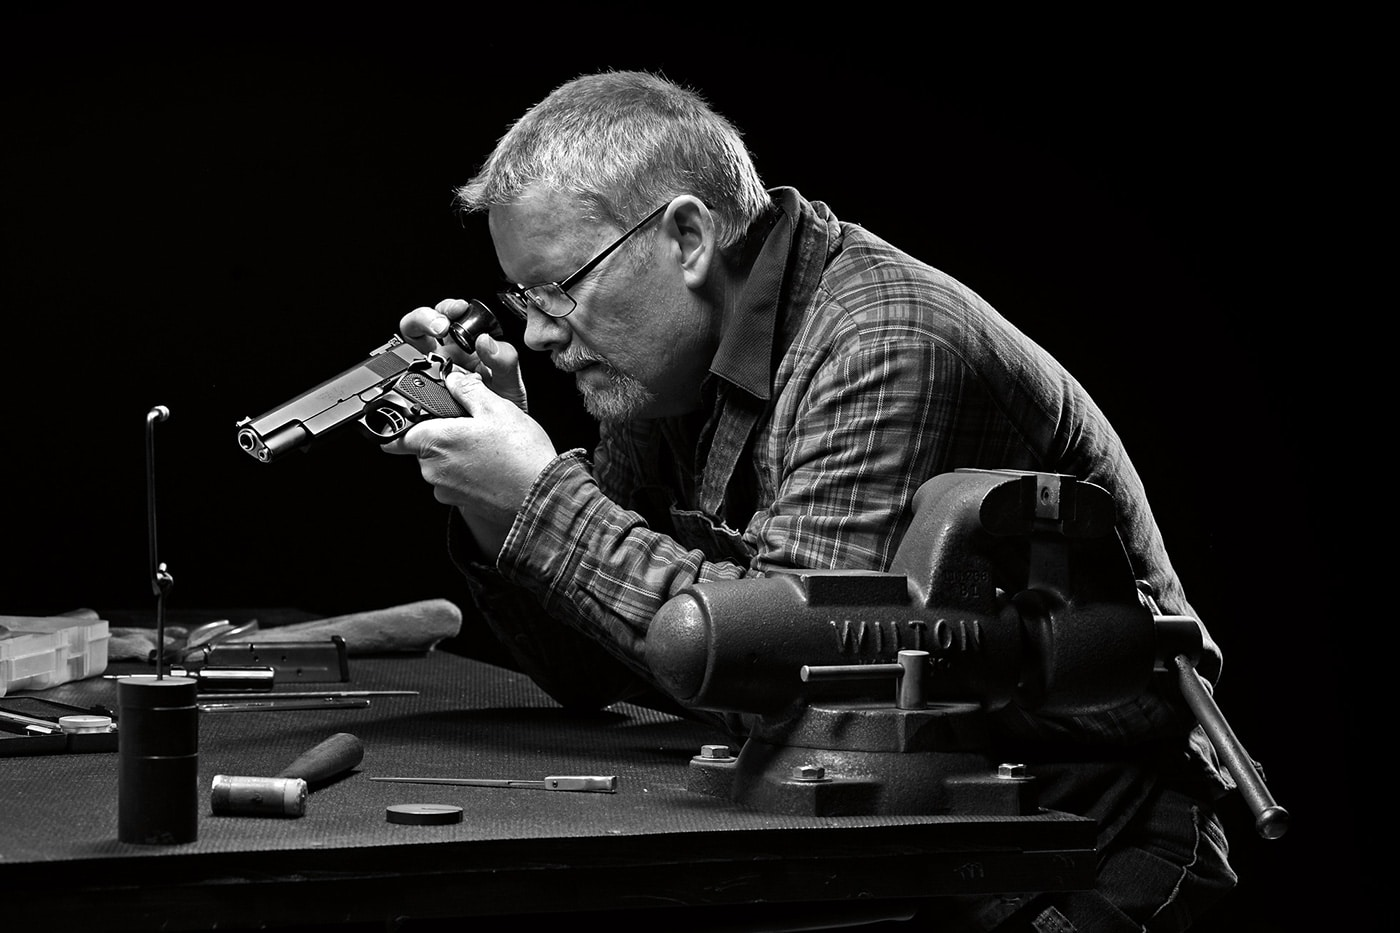 Springfield employee fixing a gun